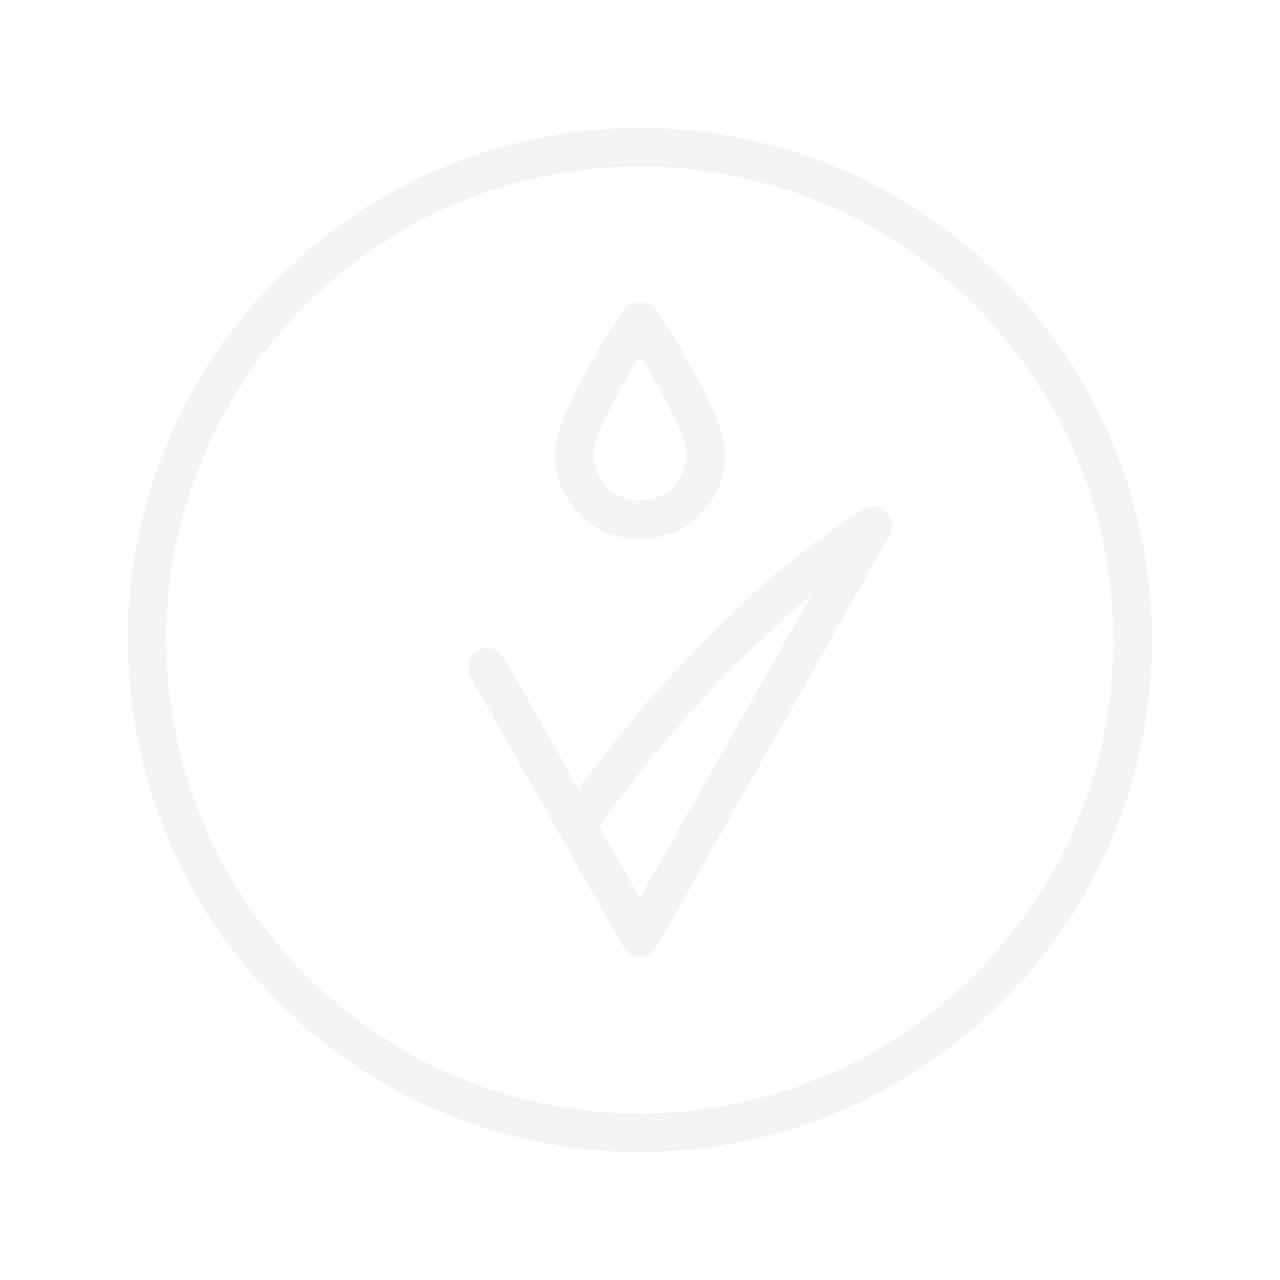 MINIGOLD Agaton Earrings